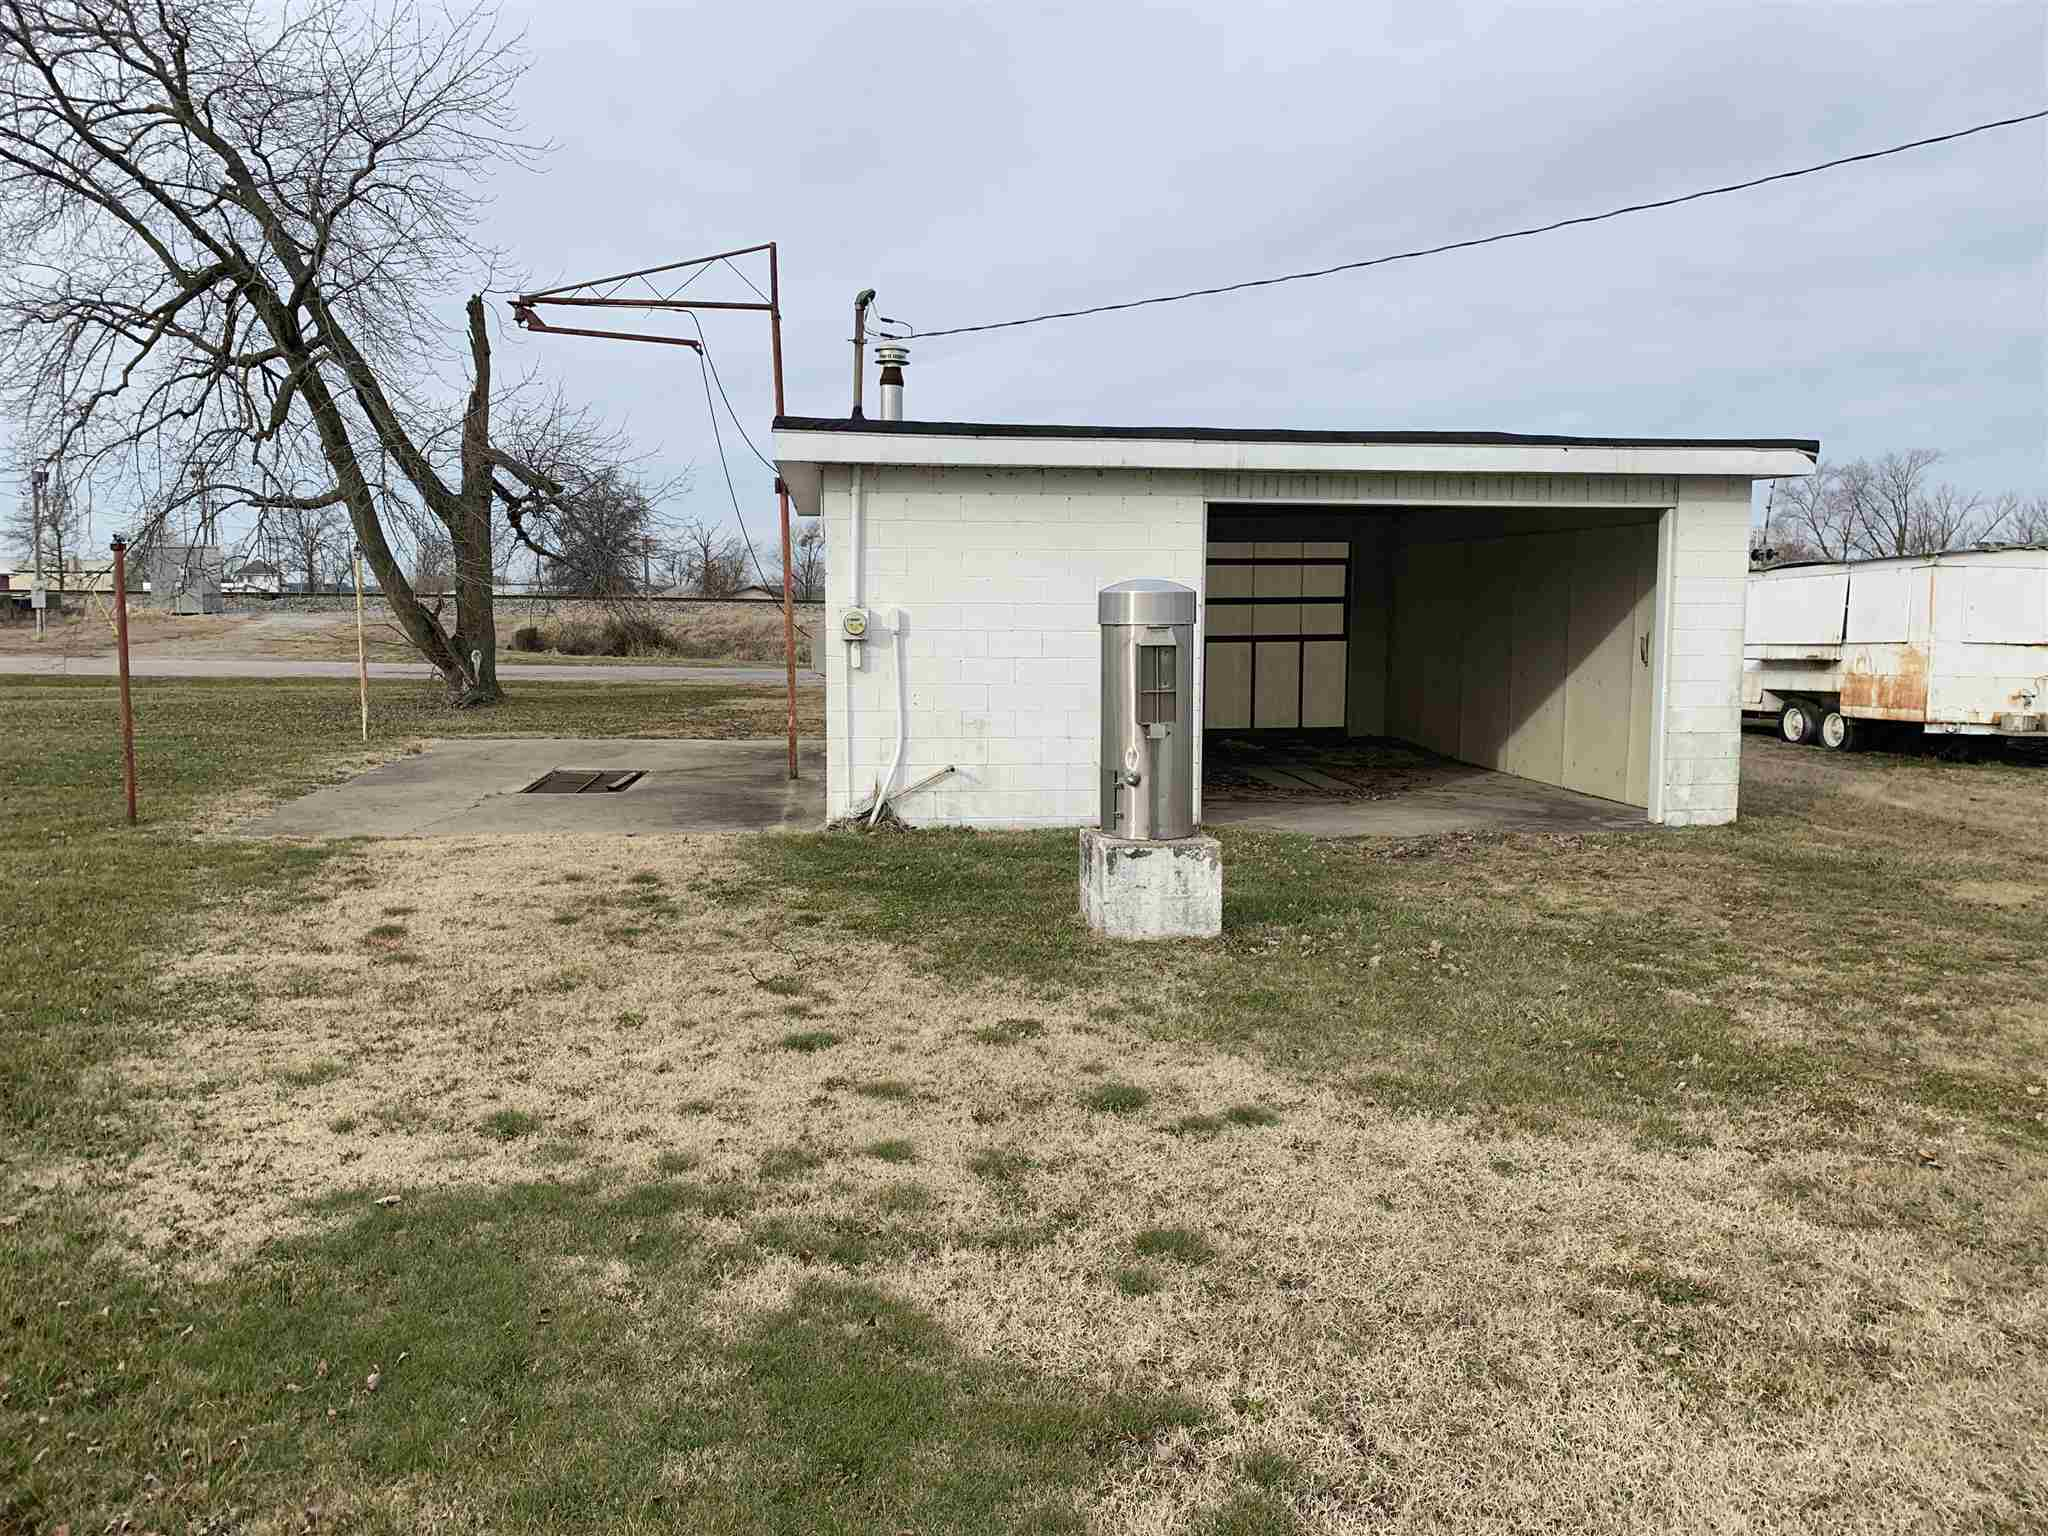 104 E Superior Property Photo - Irvington, IL real estate listing